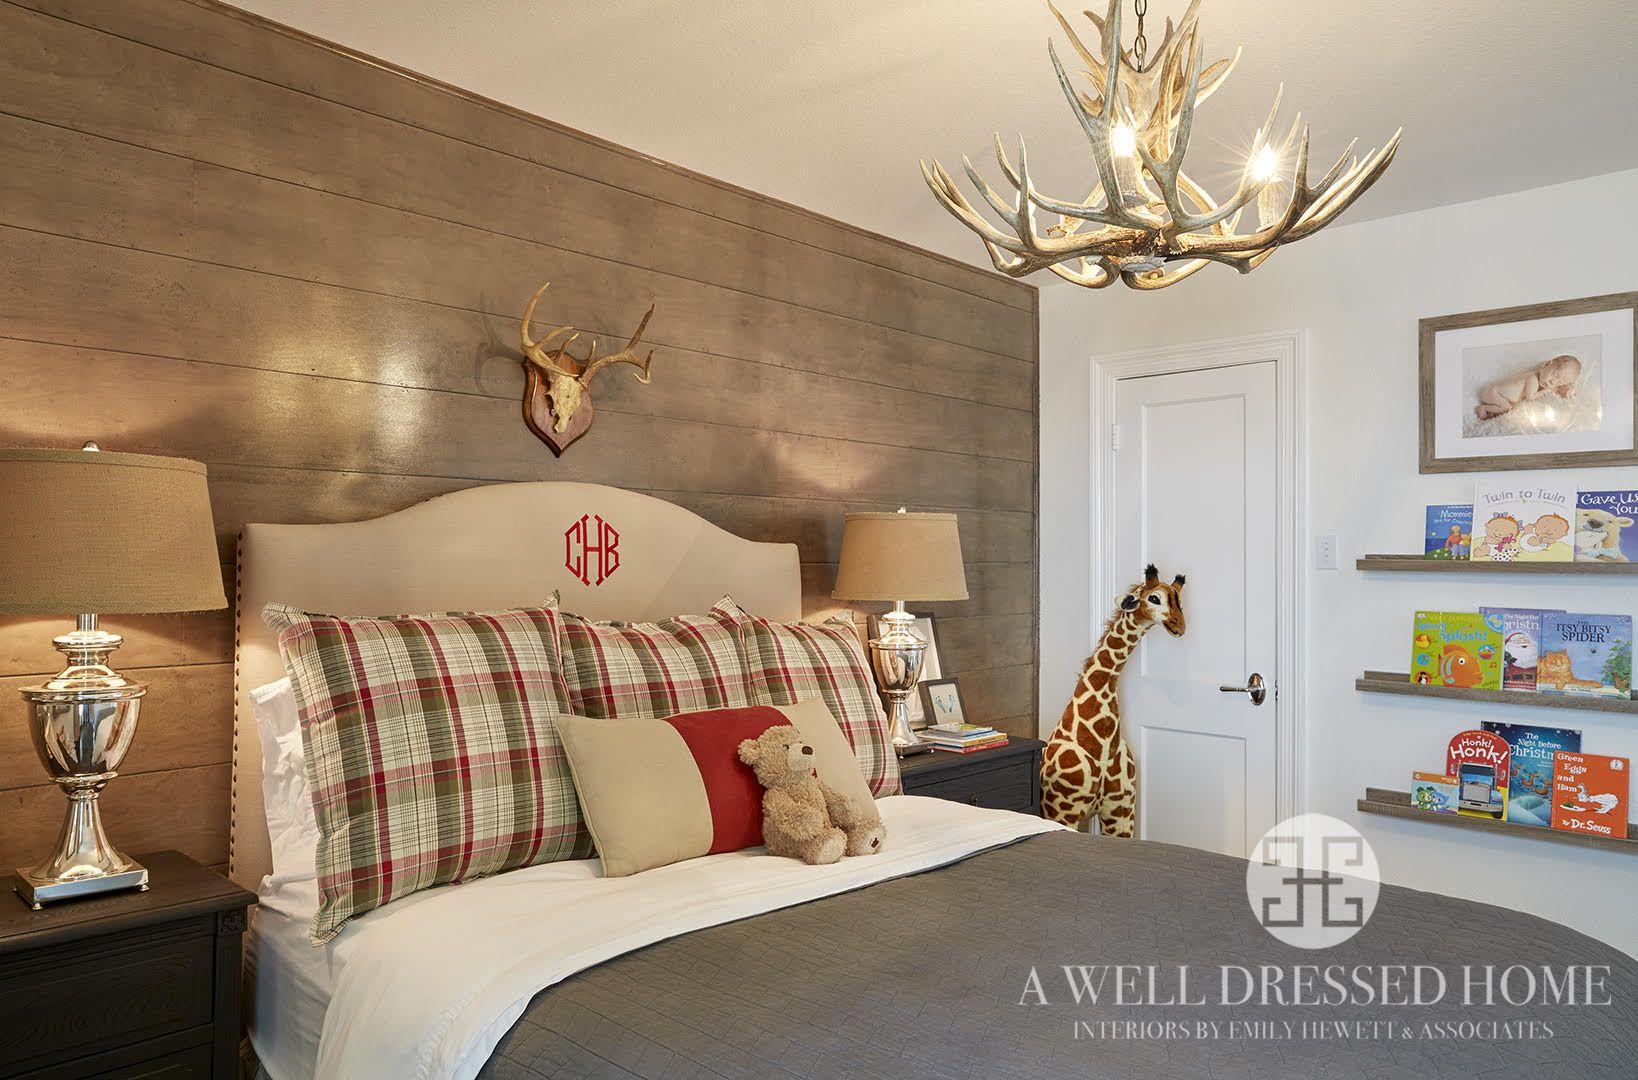 Black And Tan Boys Bedroom Decorating Ideas - Free ...